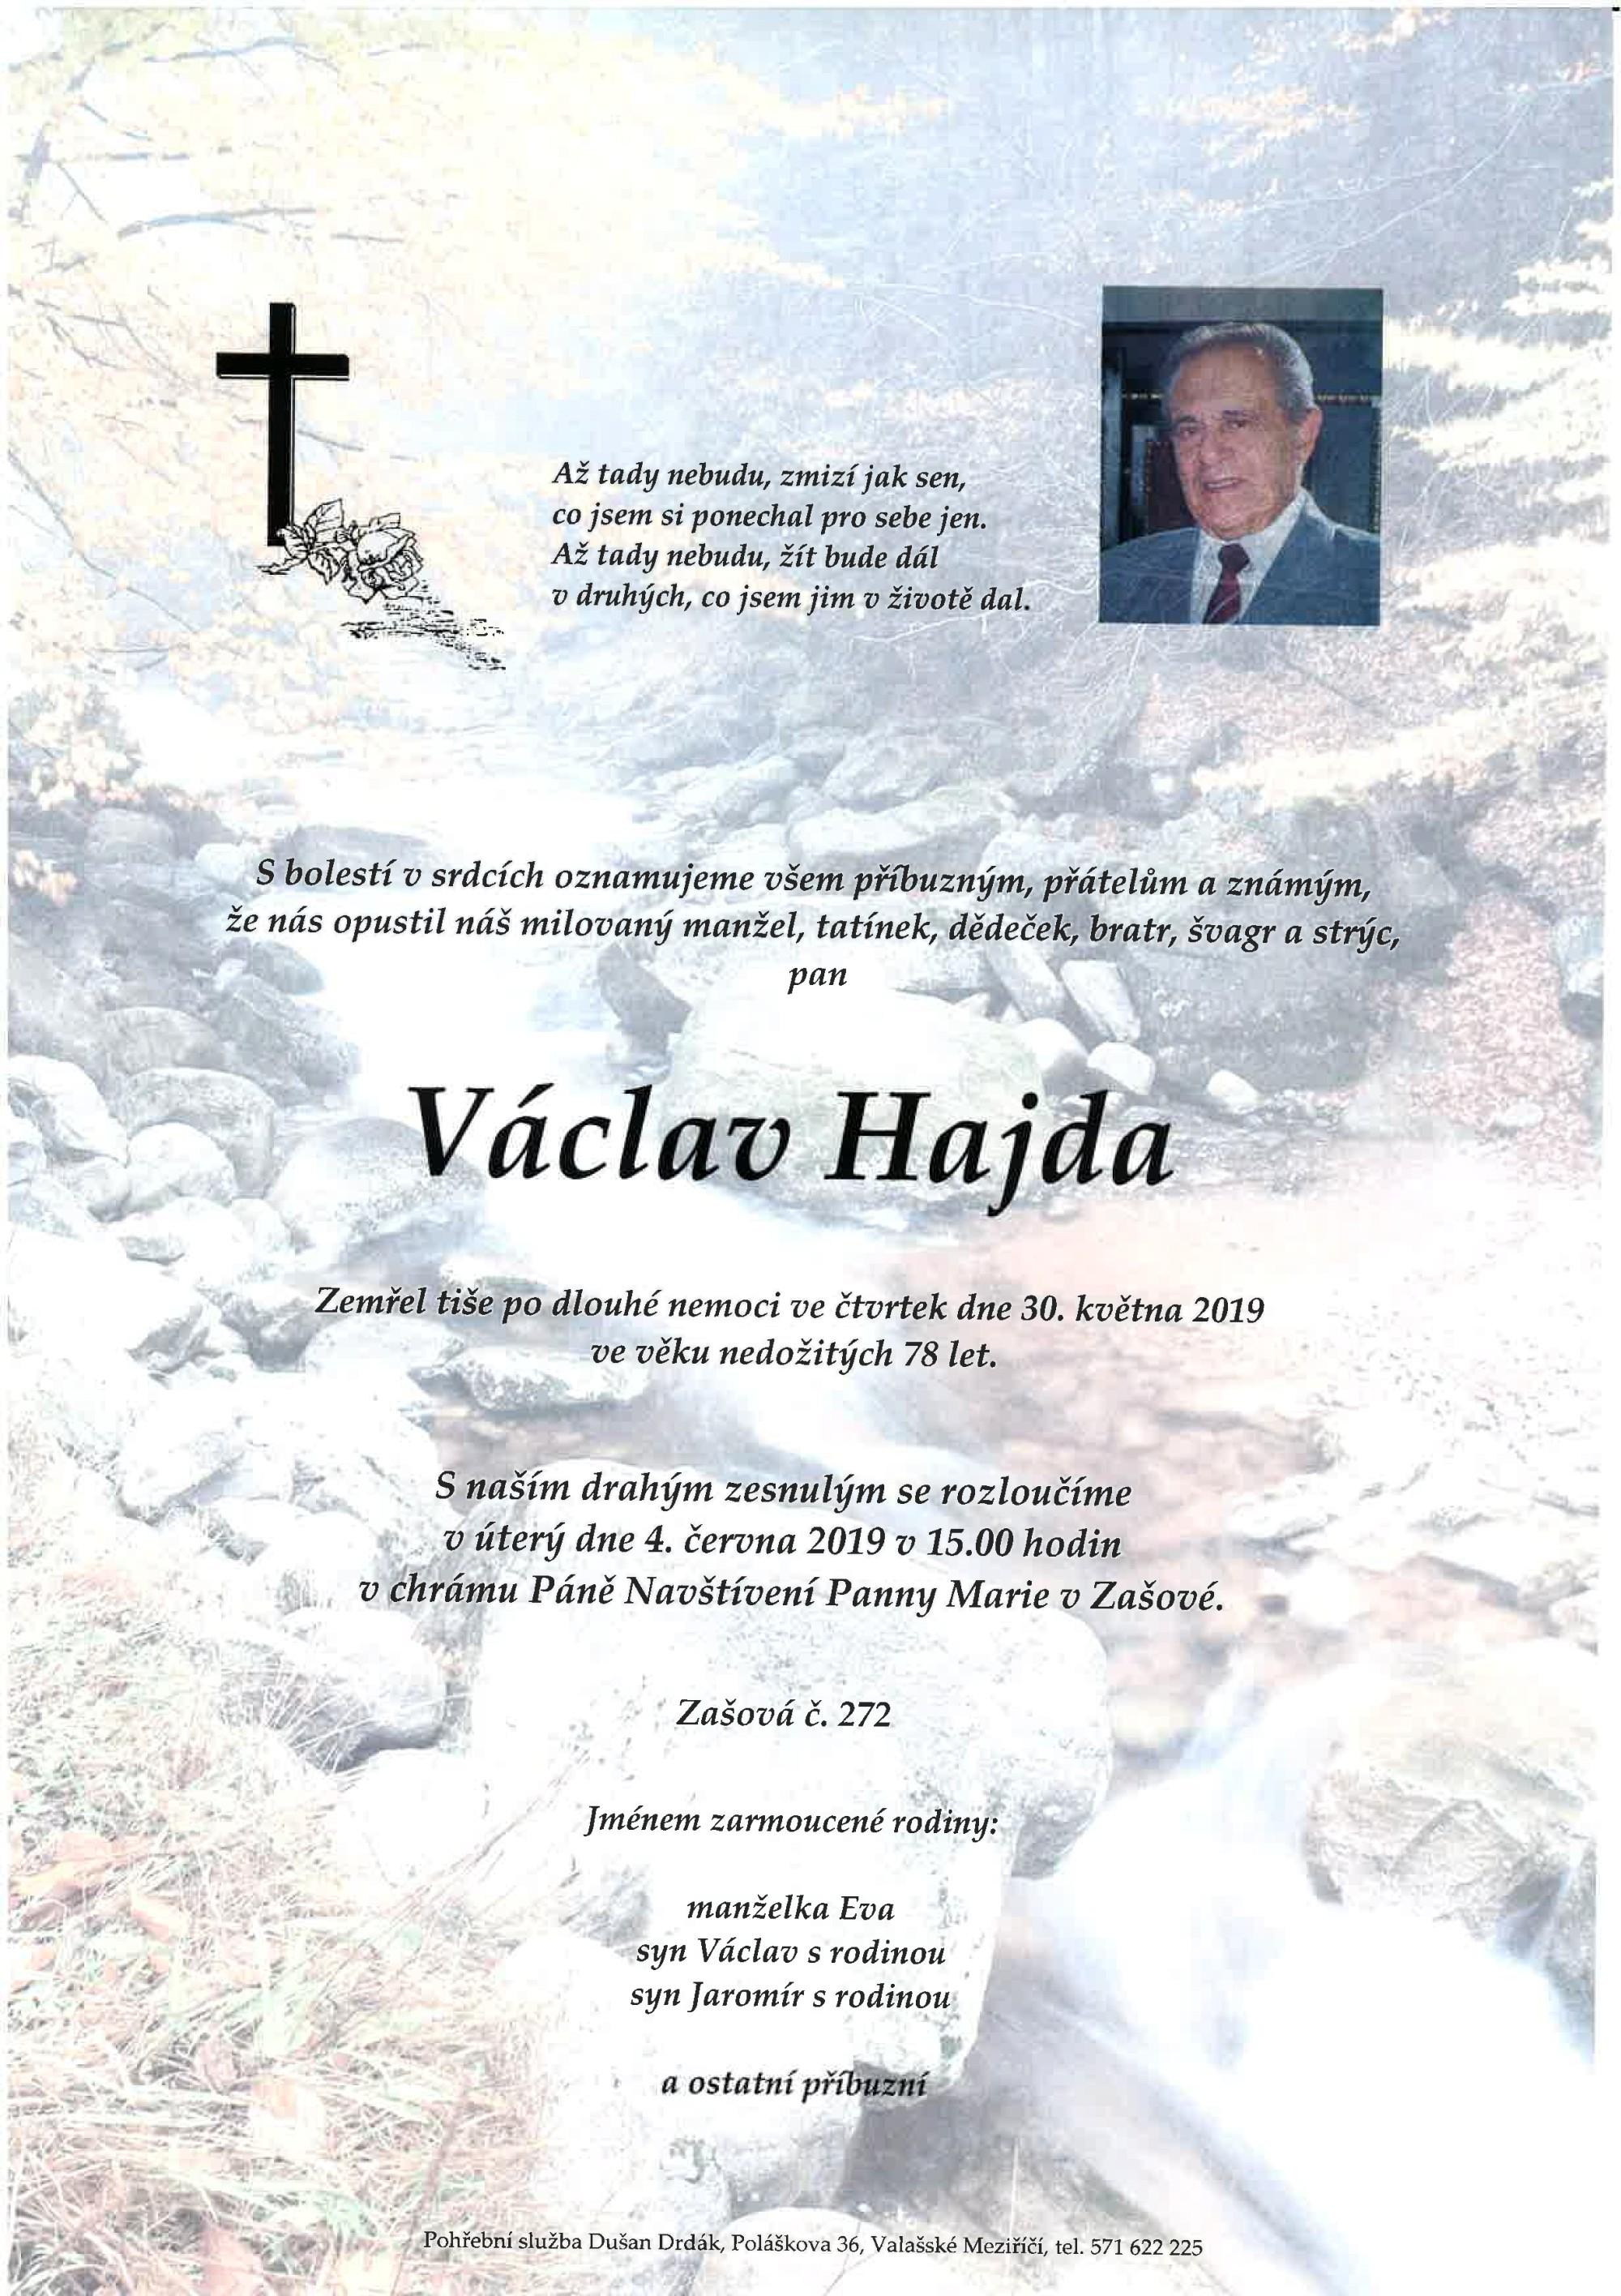 Václav Hajda